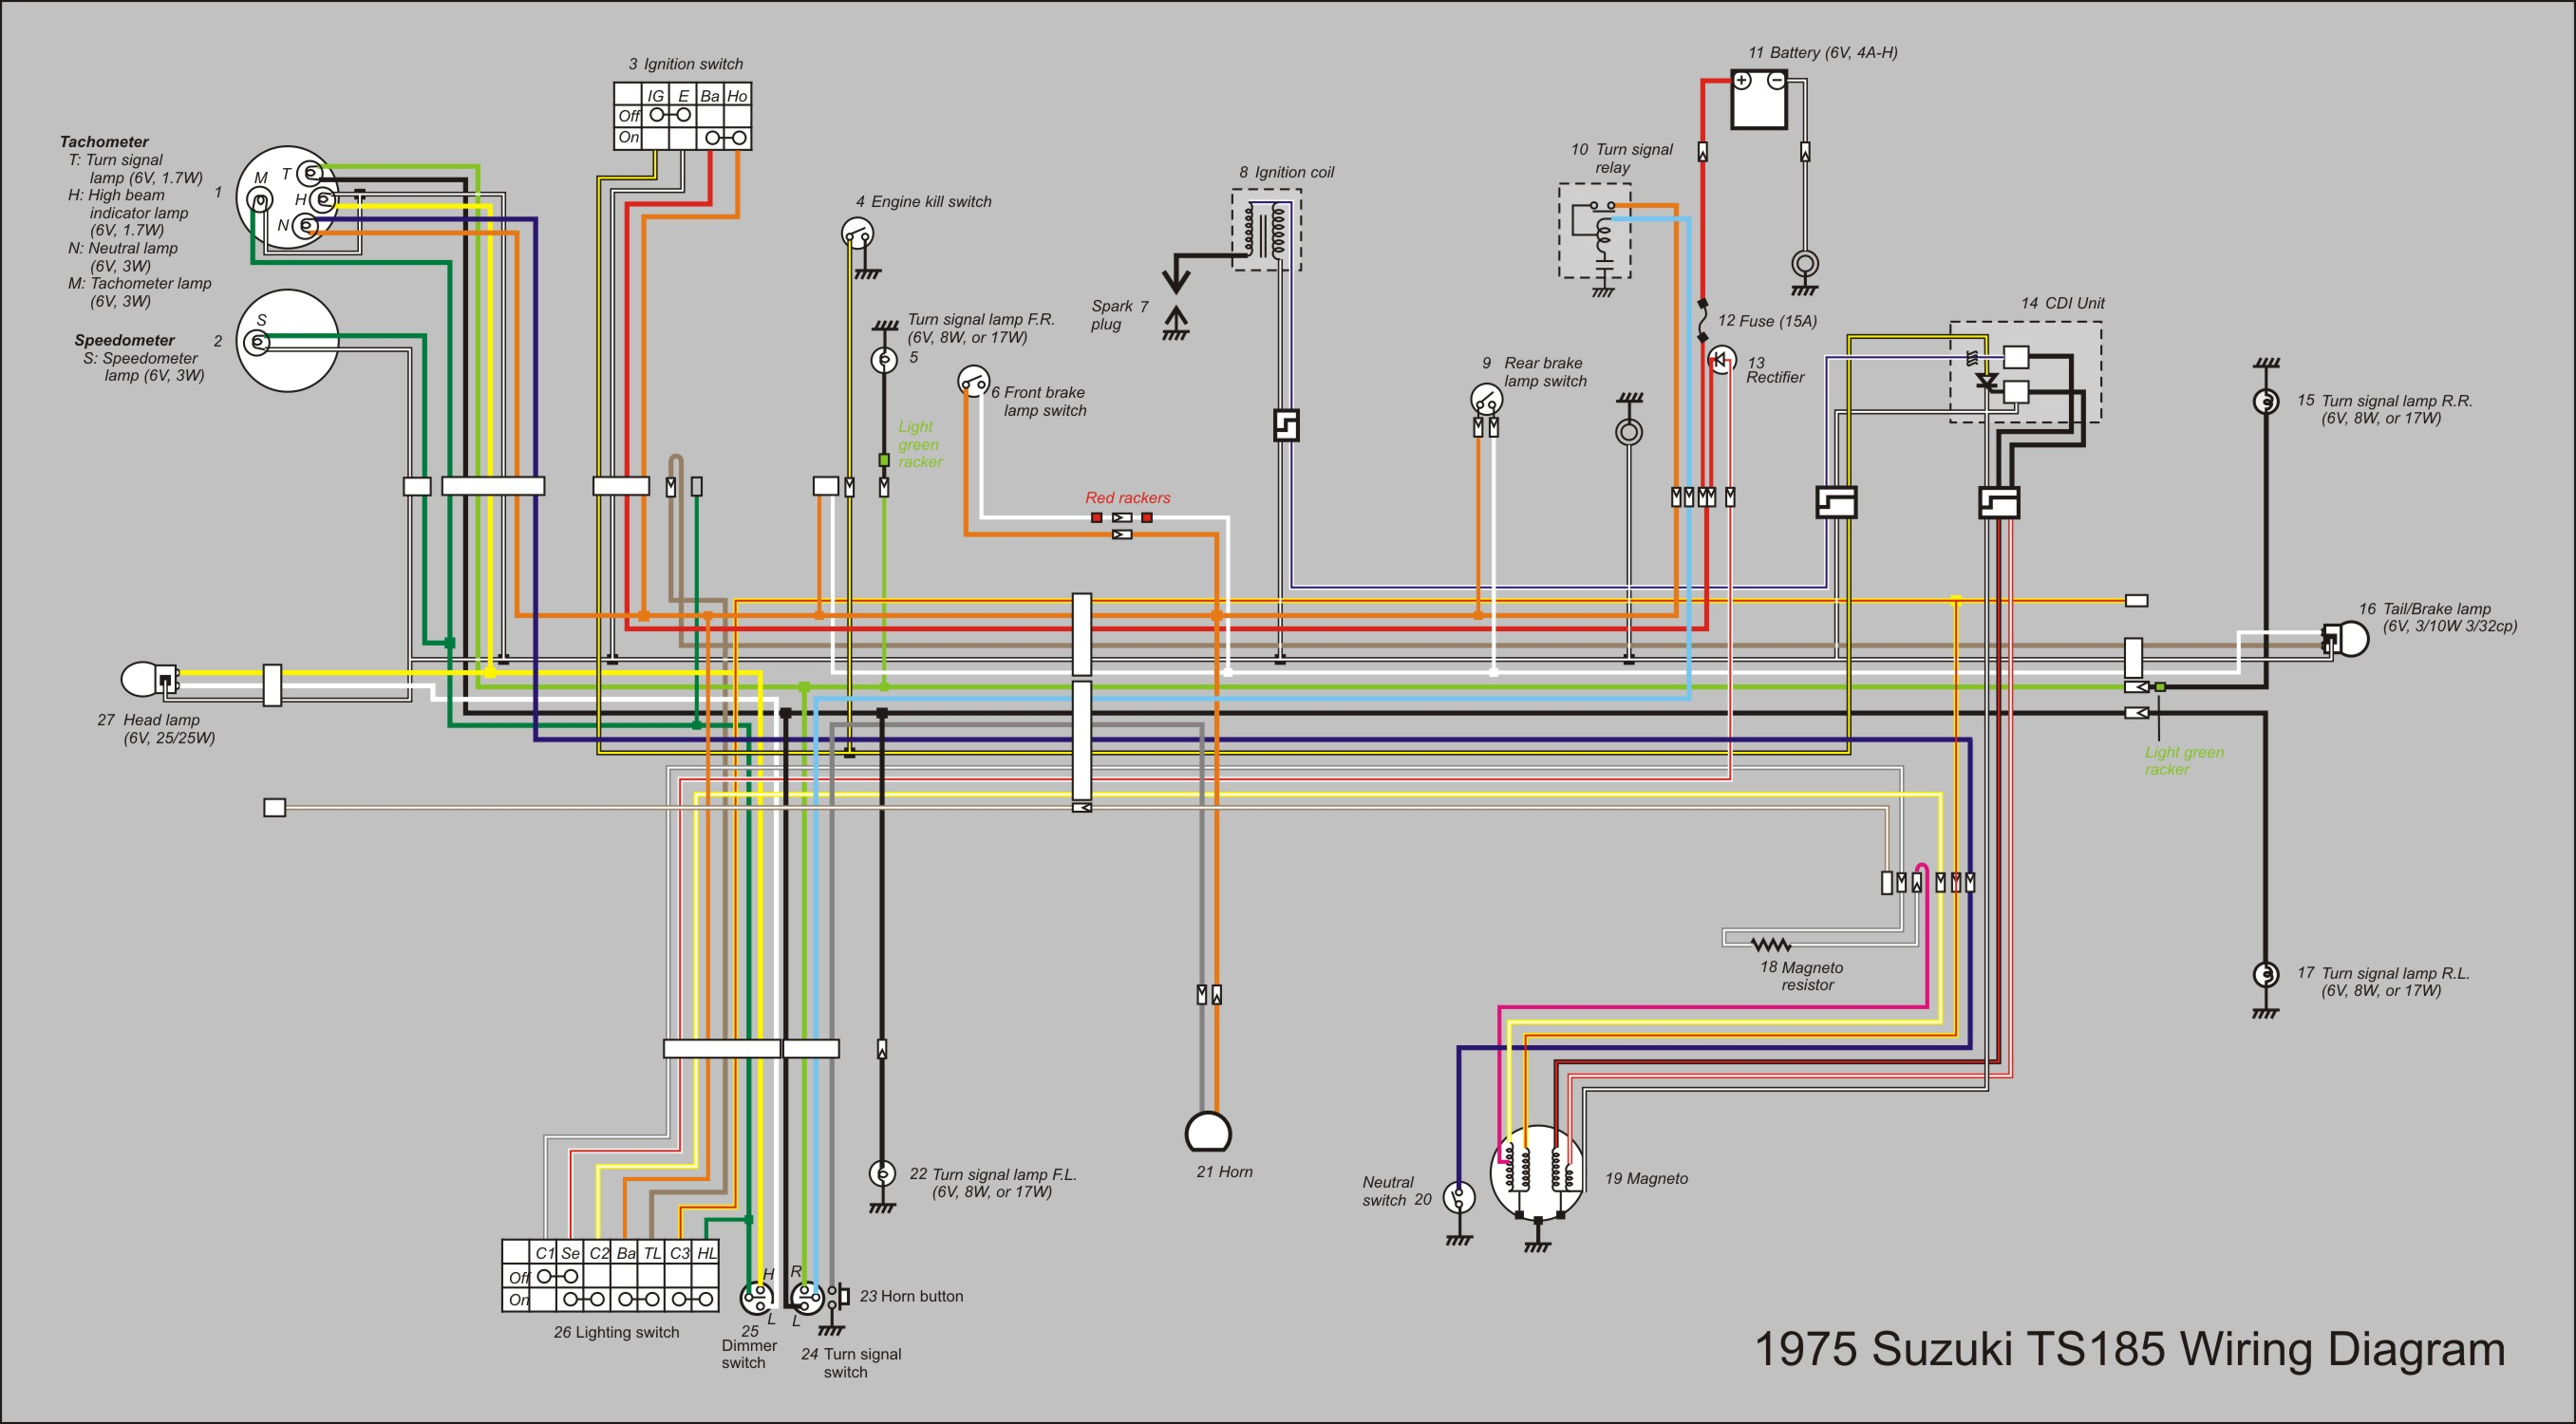 Peachy Suzuki Wire Diagram Wiring Diagram Data Today Wiring Cloud Timewinrebemohammedshrineorg